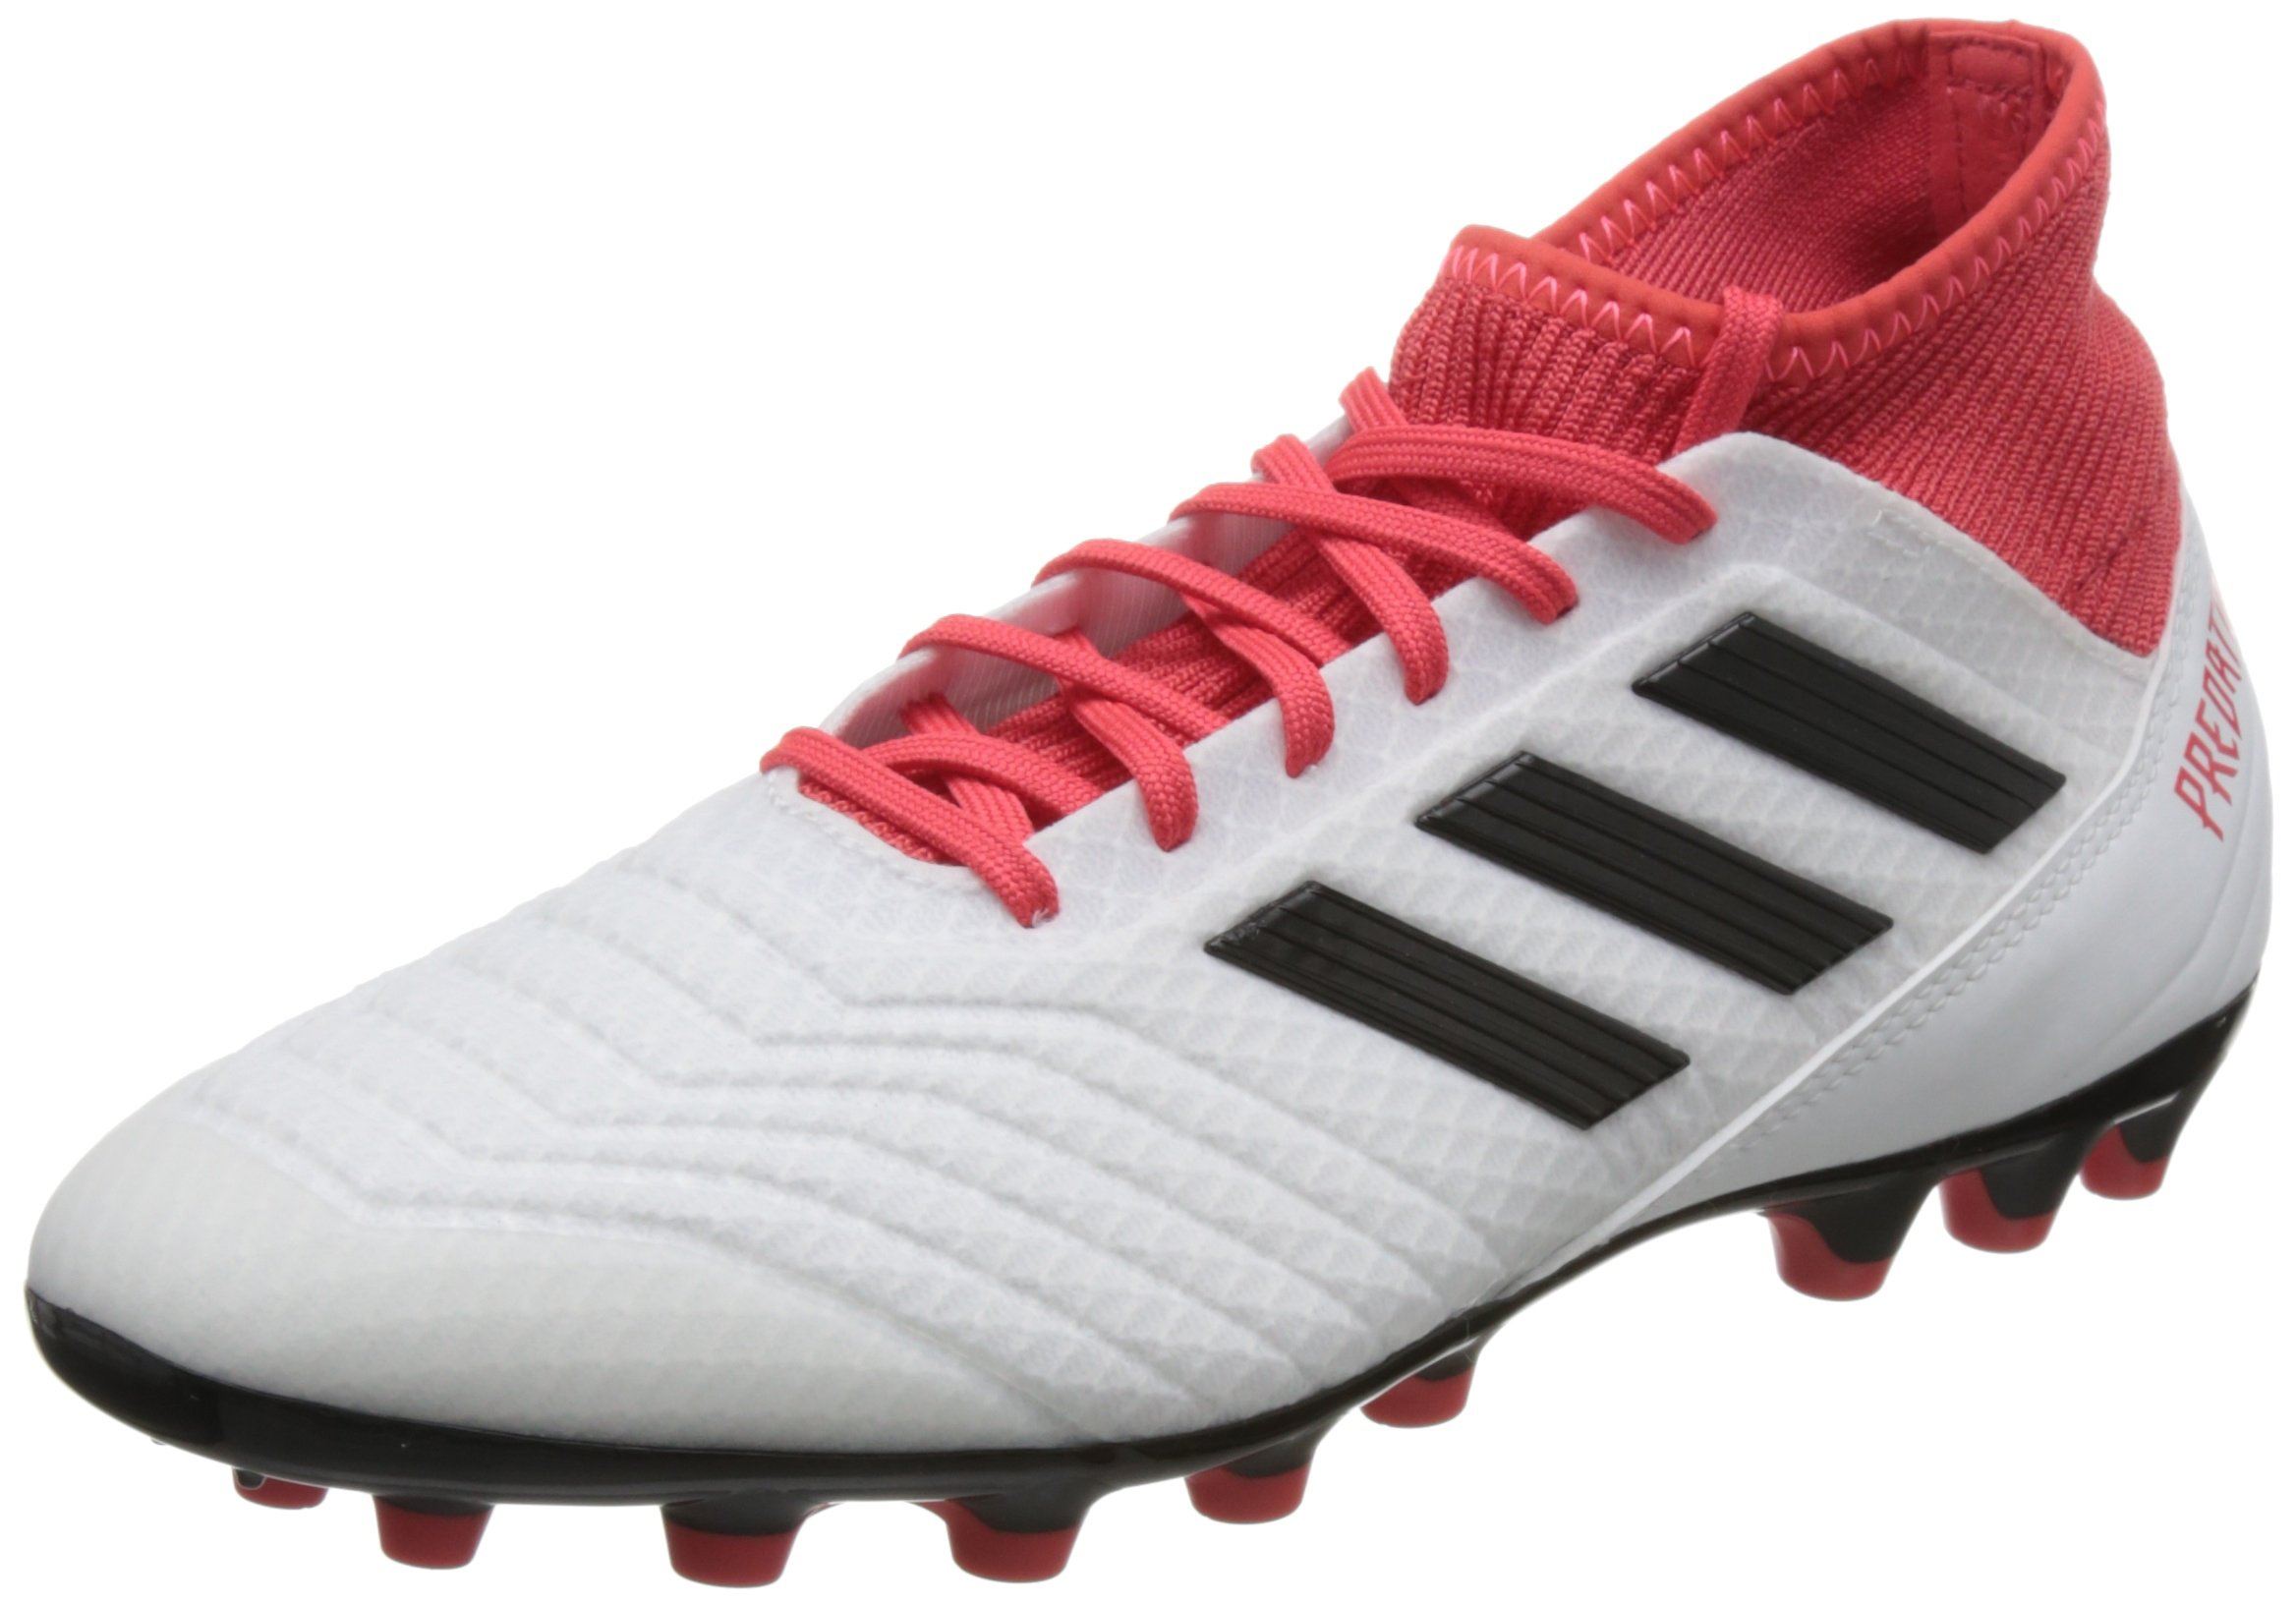 2 Adidas Coral40 Predator Eu AgChaussures Football real HommeBlancfootwear 3 Black 3 De core 18 White hCtQdxsr